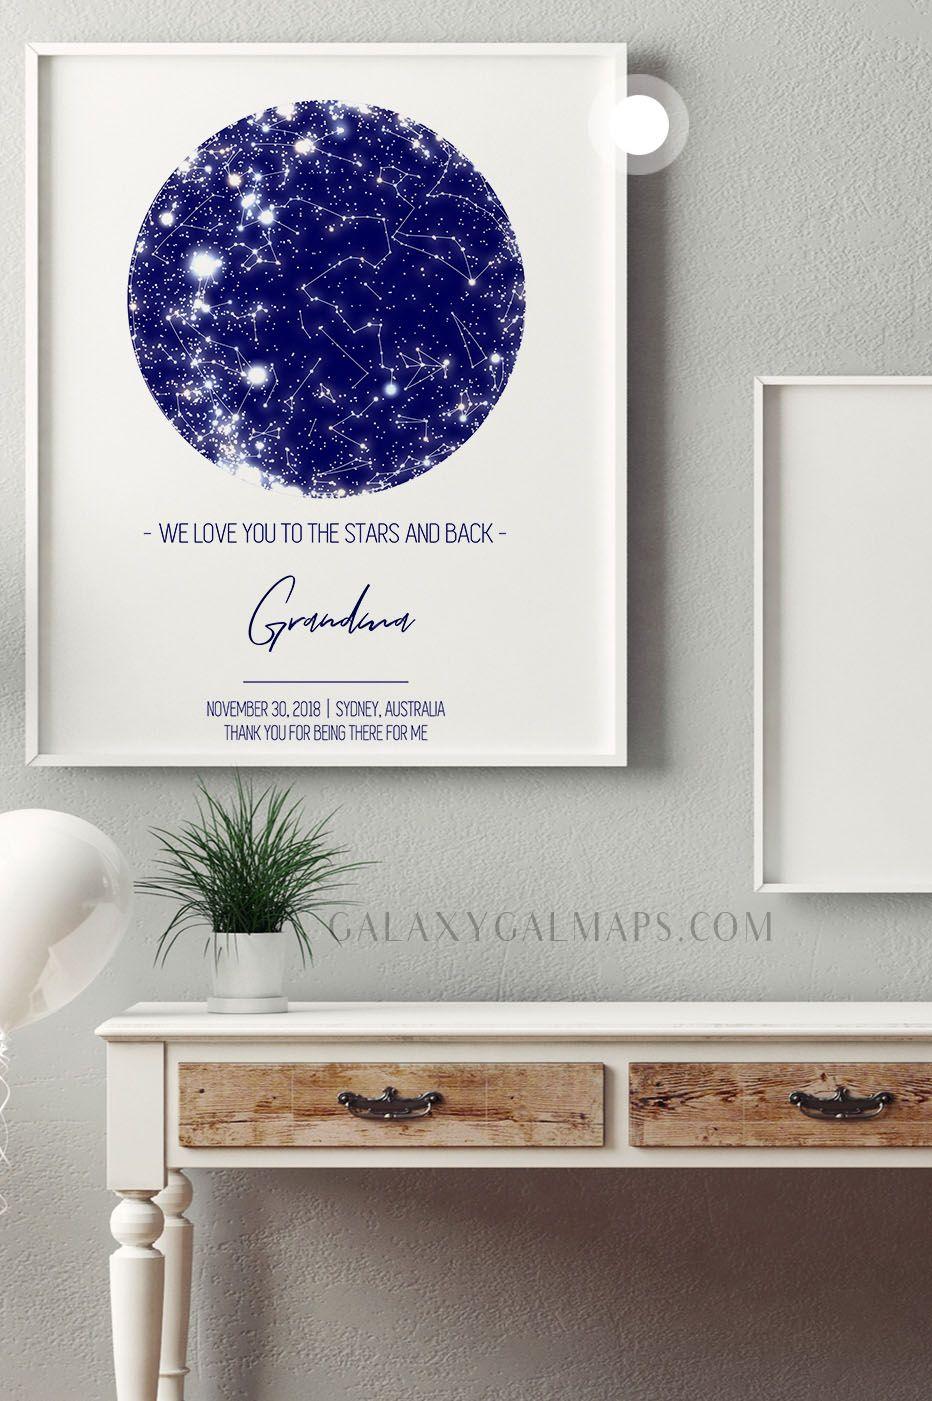 Glitter Force New Custom Personalized Art Print Poster Wall Decor